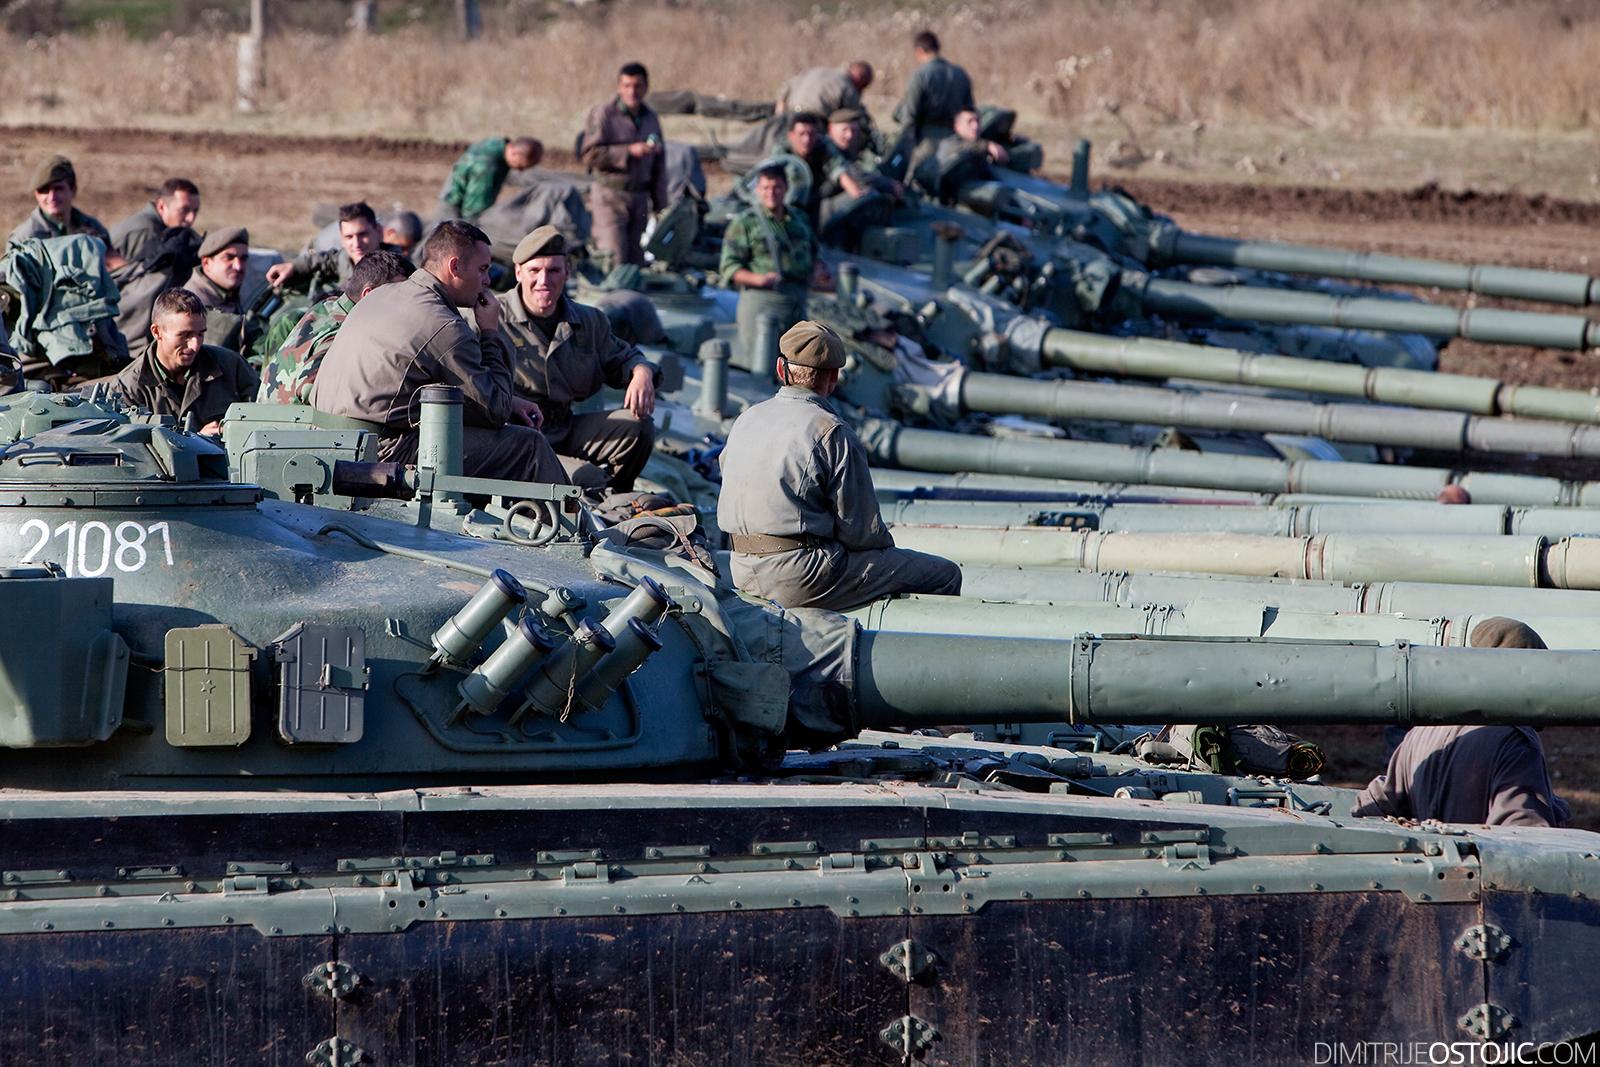 Tank M-84 Serbian Army ,military exercise Odlucan Odgovor 2009, Serbia, Pesterska visoravan, Oktobar 2009 © www.dimitrijeostojic.com